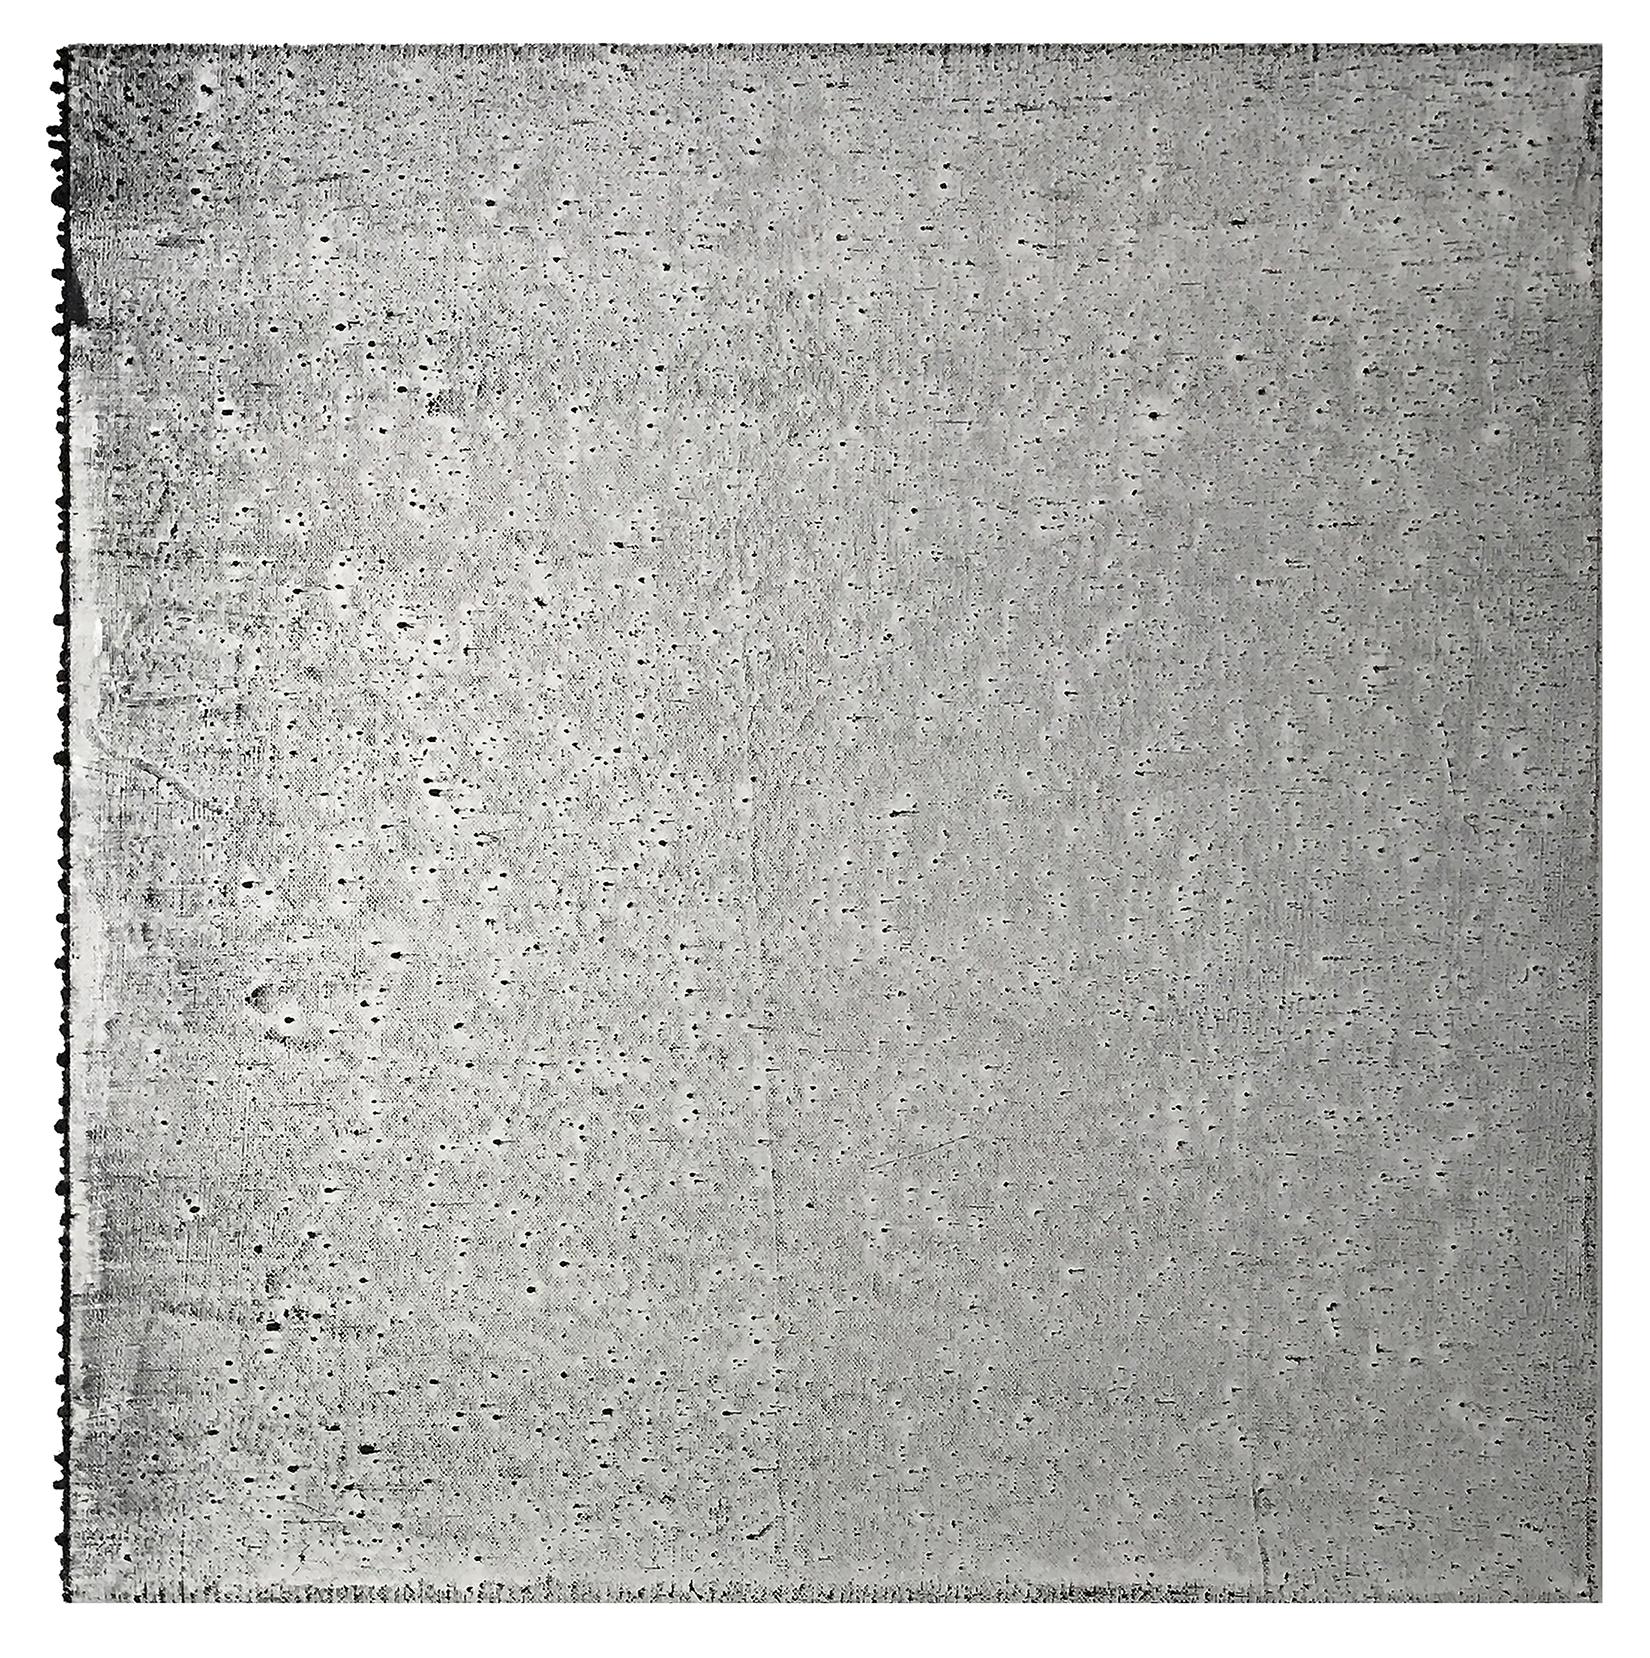 Simon Granell, March 2016 - March 2017, oil on linen, 40 x 04 x 2 cm,  http://www.simongranell.co.uk